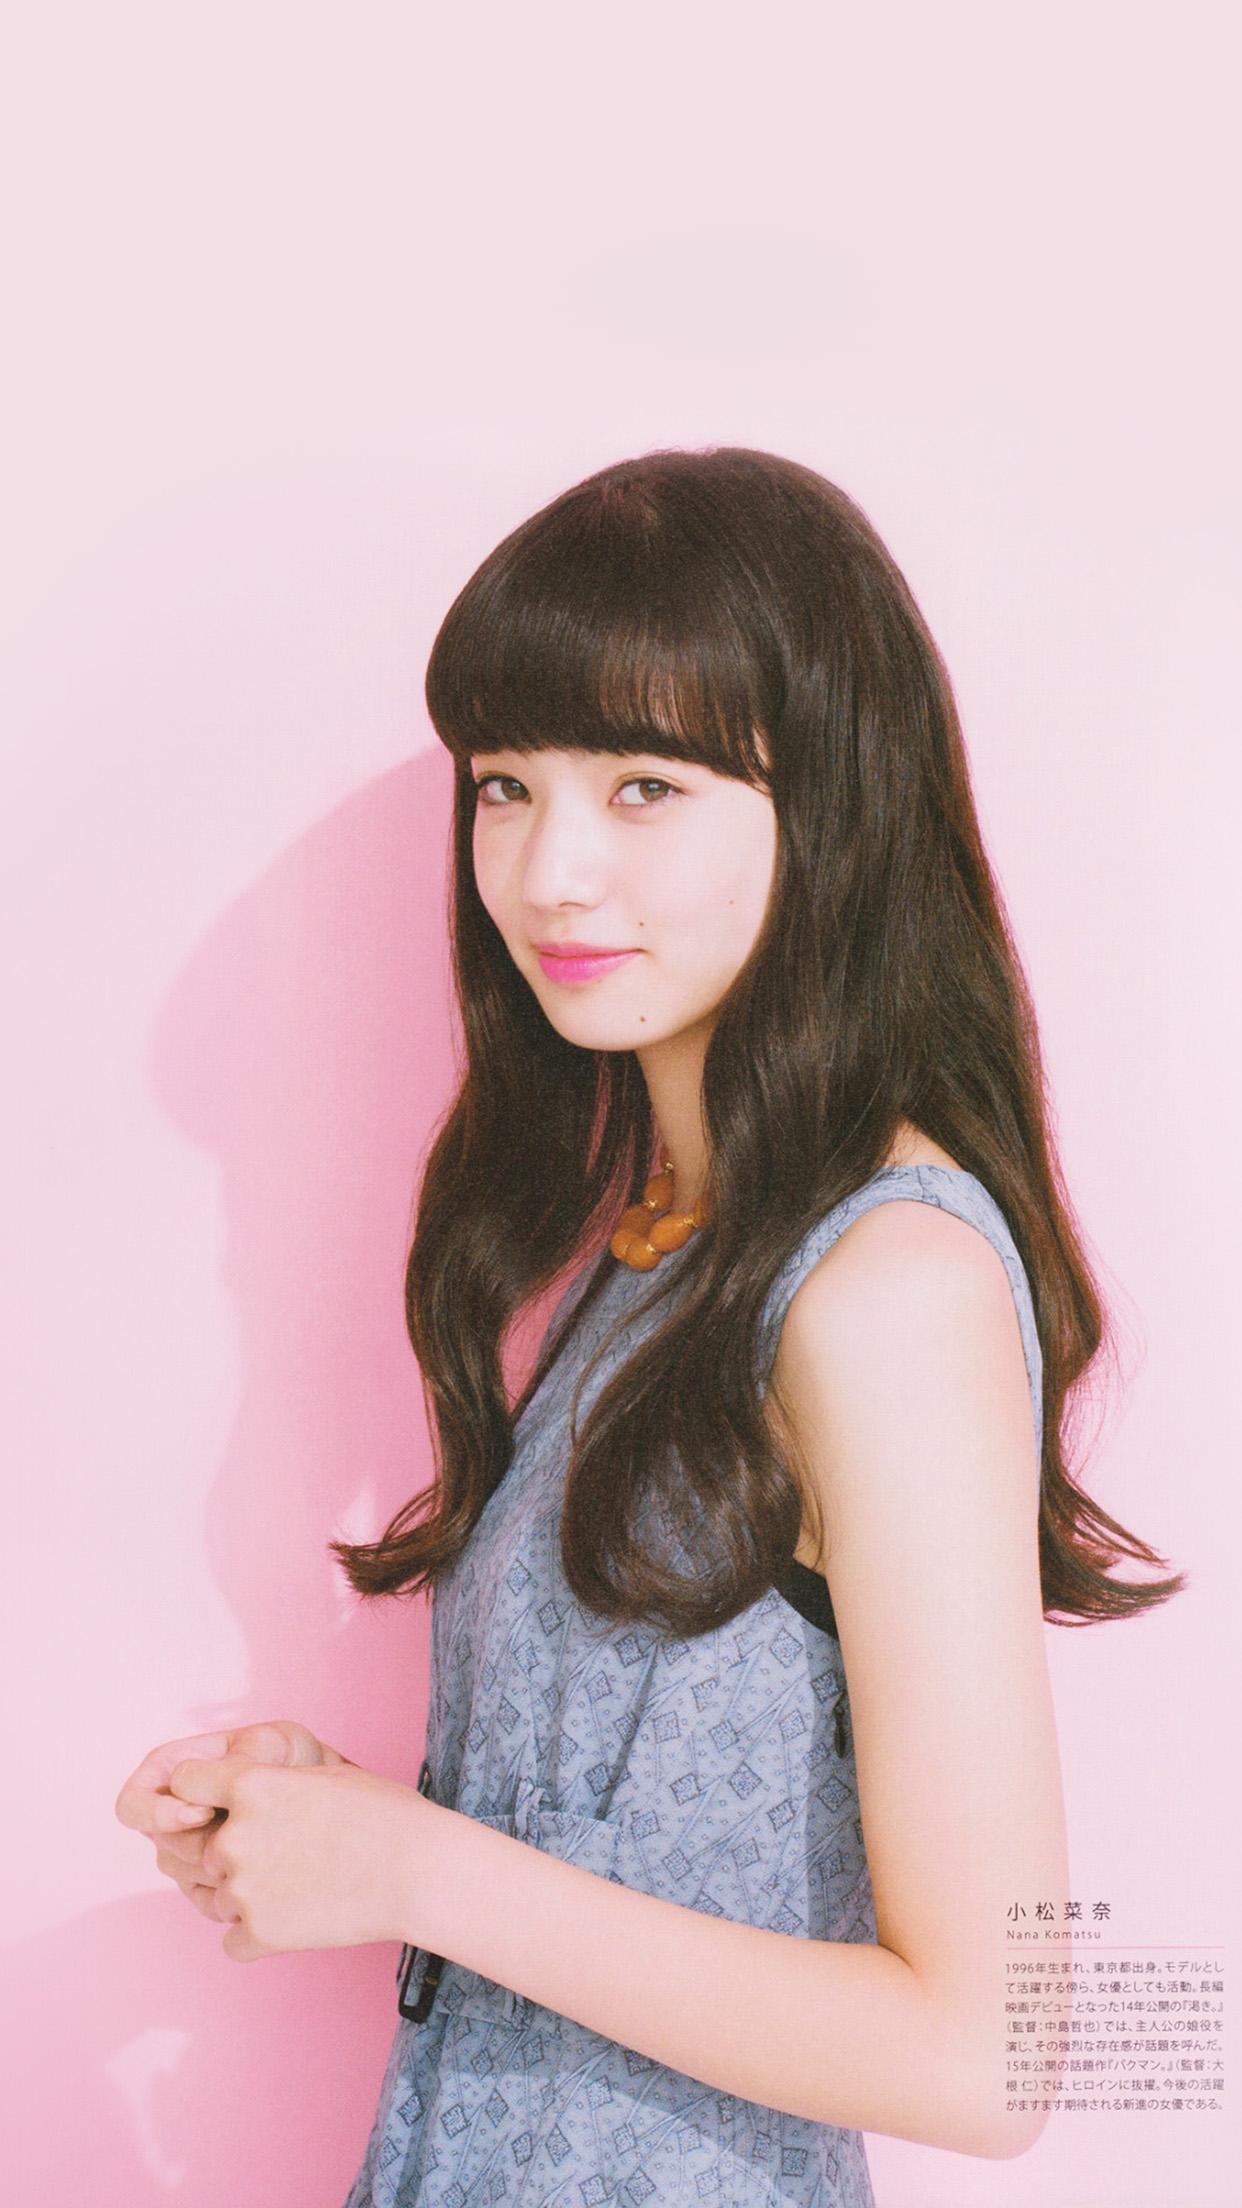 Korean Cute Girl Hd Wallpaper Hn41 Nana Komatsu Cute Film Asian Girl Wallpaper